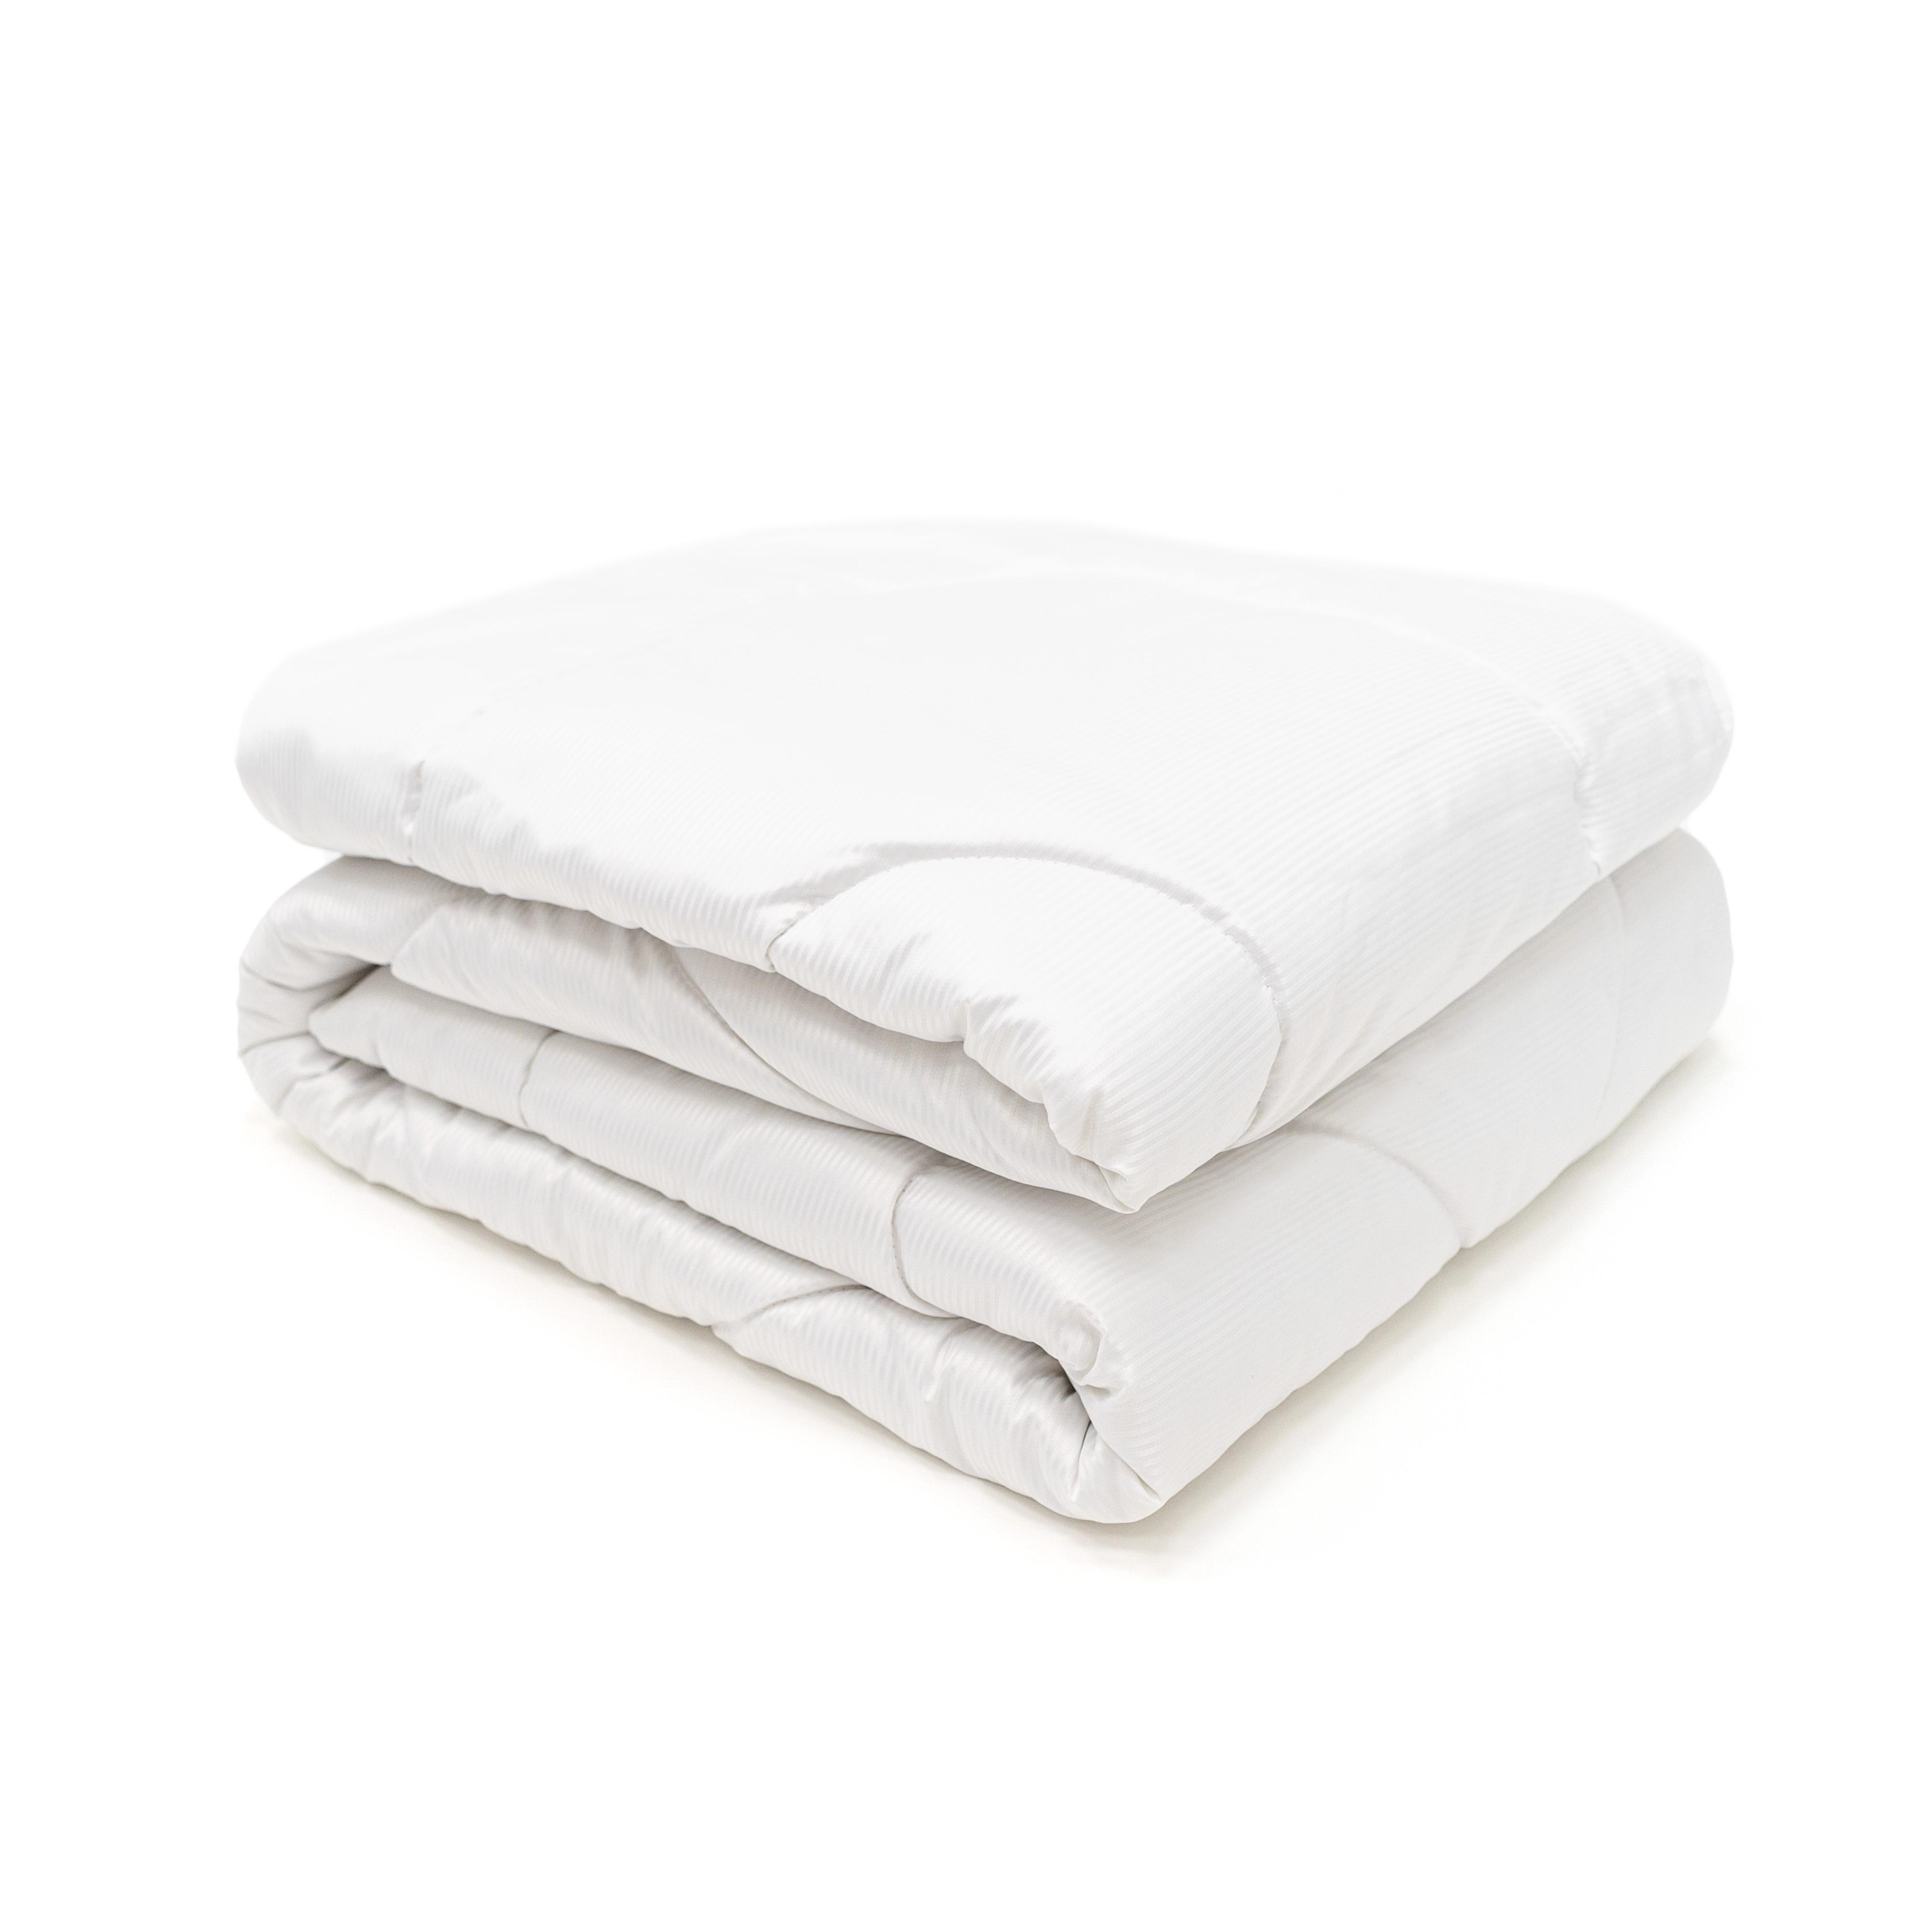 Одеяло CLASSIC by T Soft Wool (140х200 см)